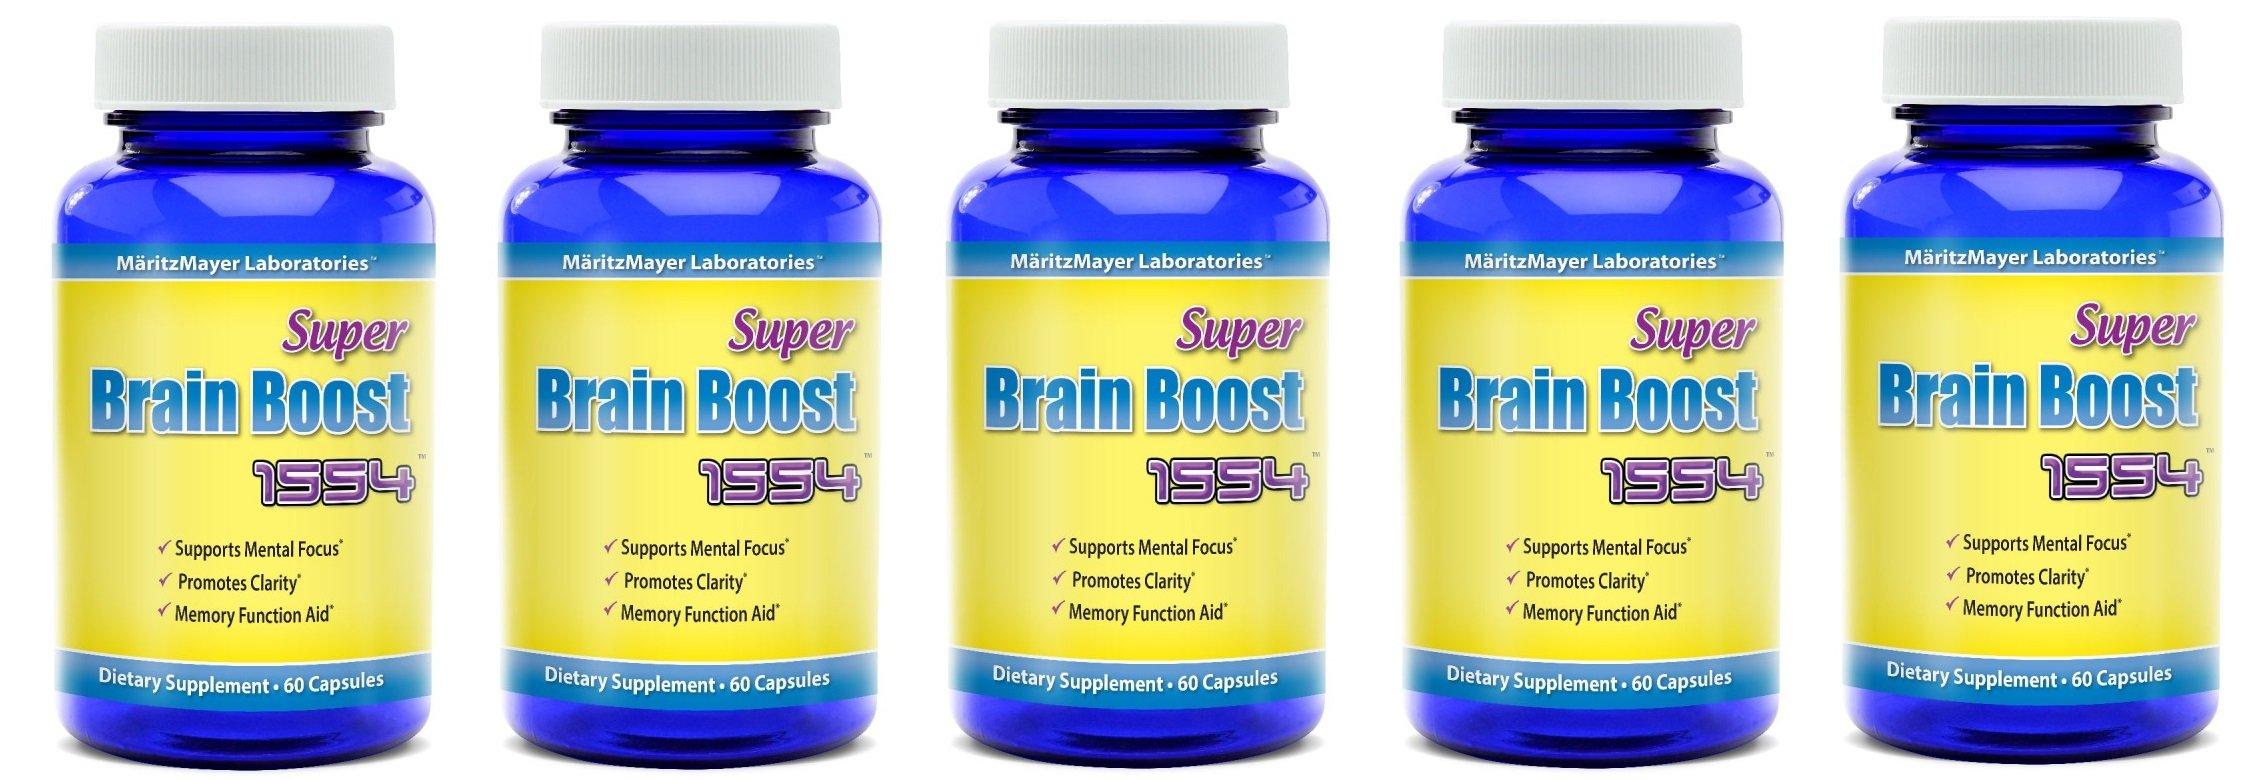 Super Brain Boost Nootropic 1554 Improve Focus Calrity Memory Concentration Contains Ginkgo Biloba St. John's Wort Bacopa Monniera DMAE 60 Capsules 5 Bottles by MaritzMayer Laboratories